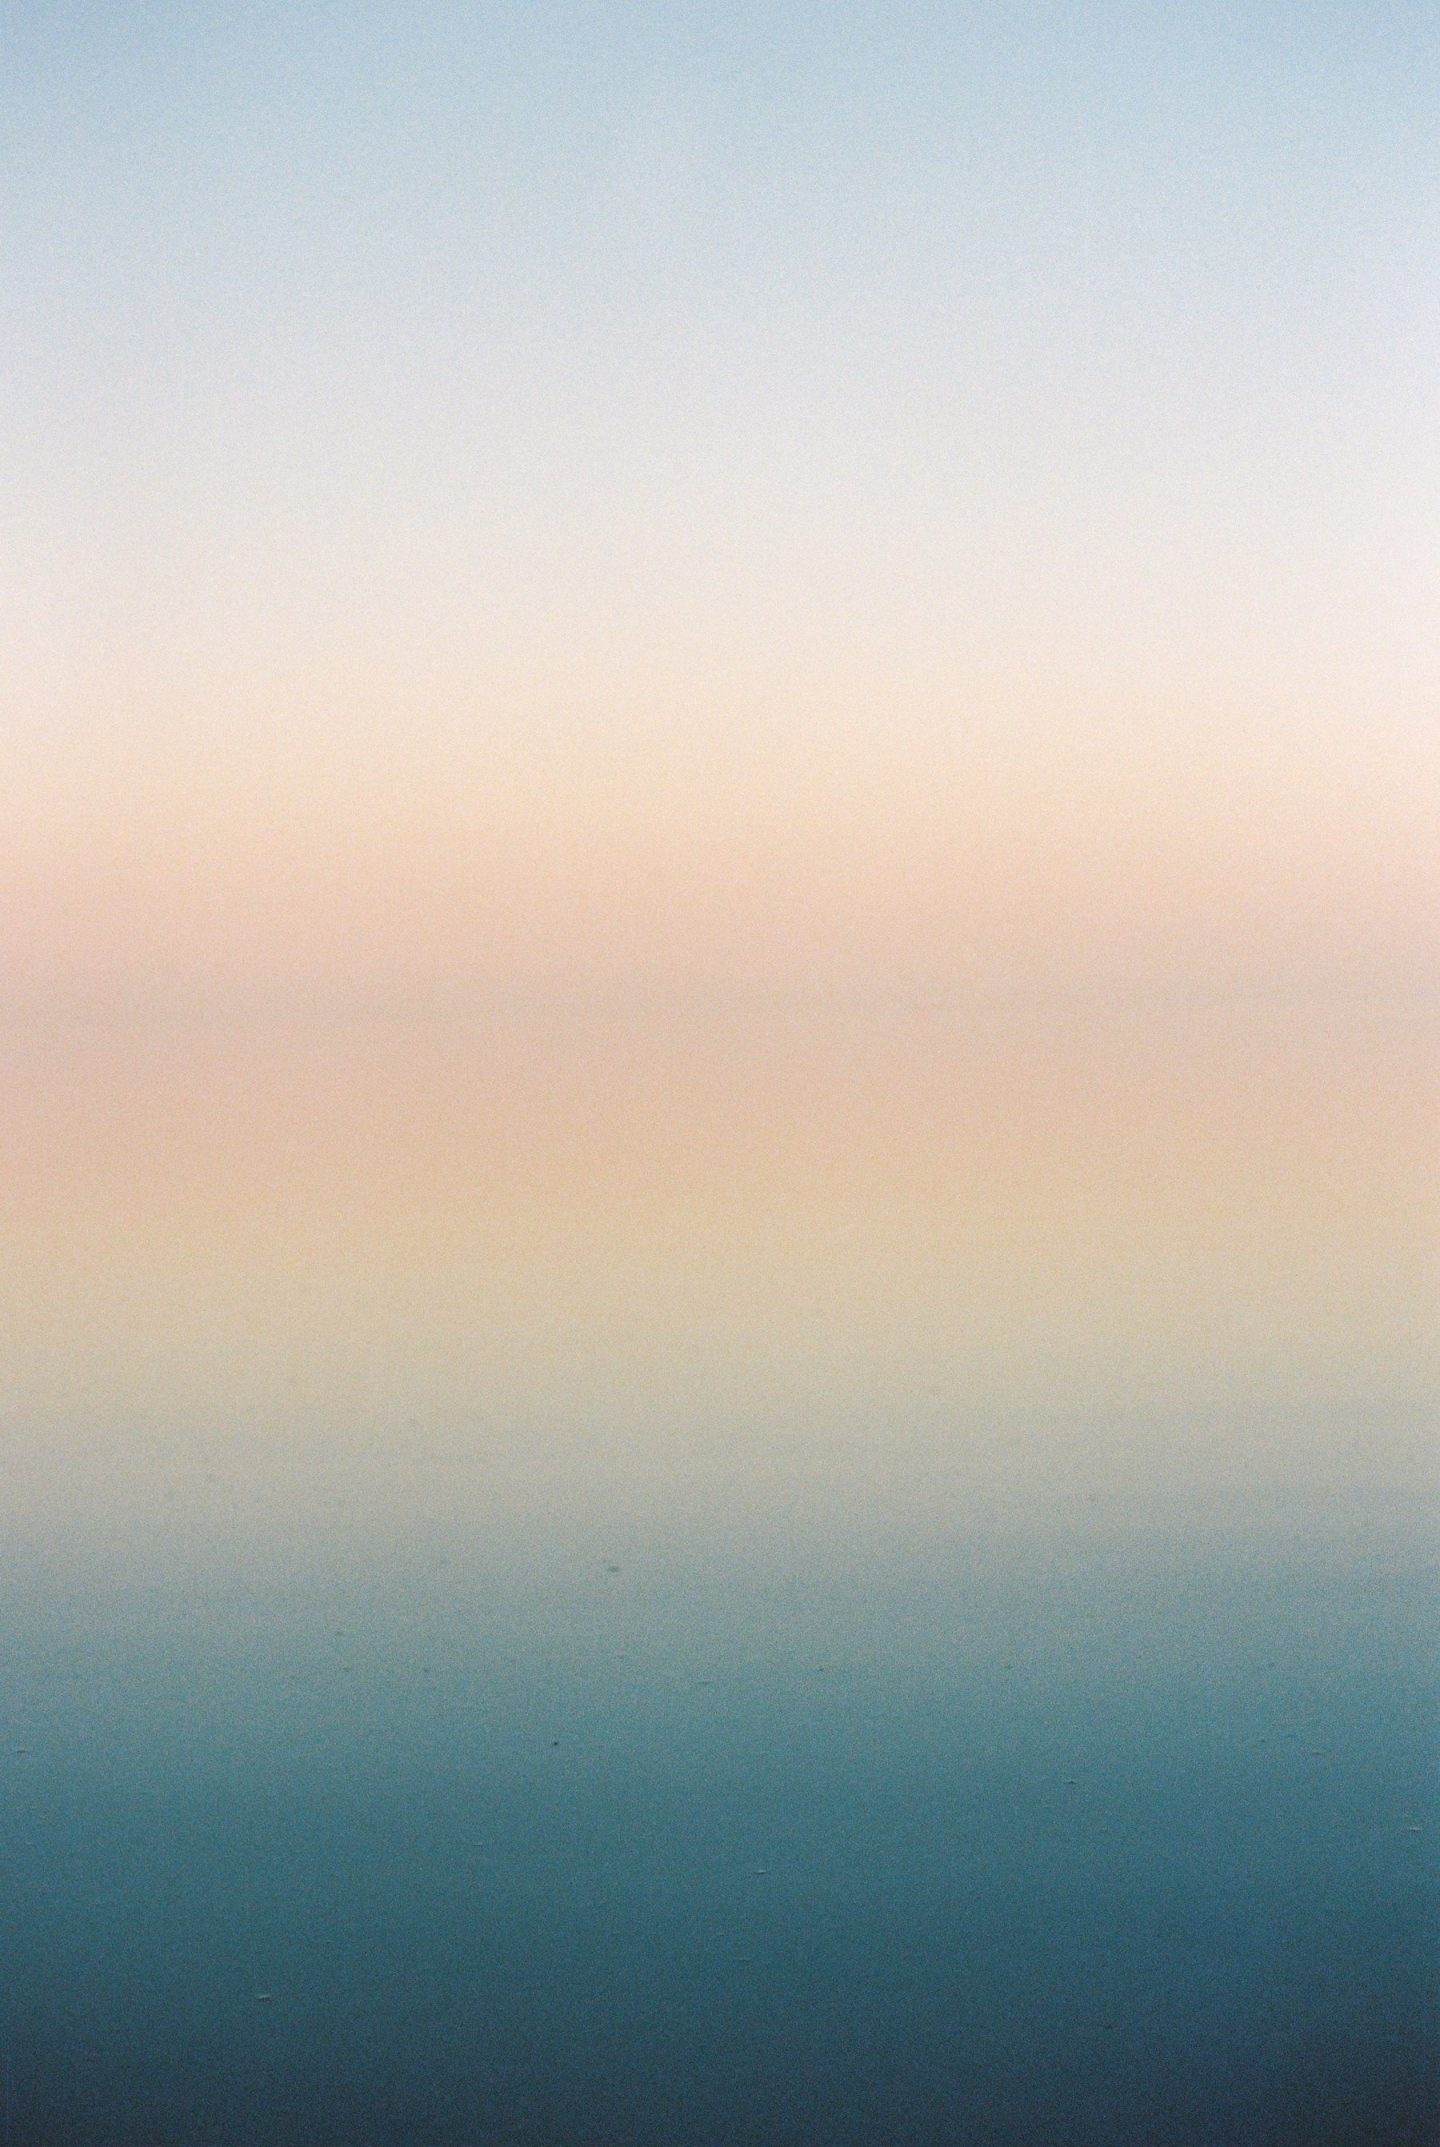 IGNANT-Photography-David-van-Dartel-This-Time-Tomorrow-06